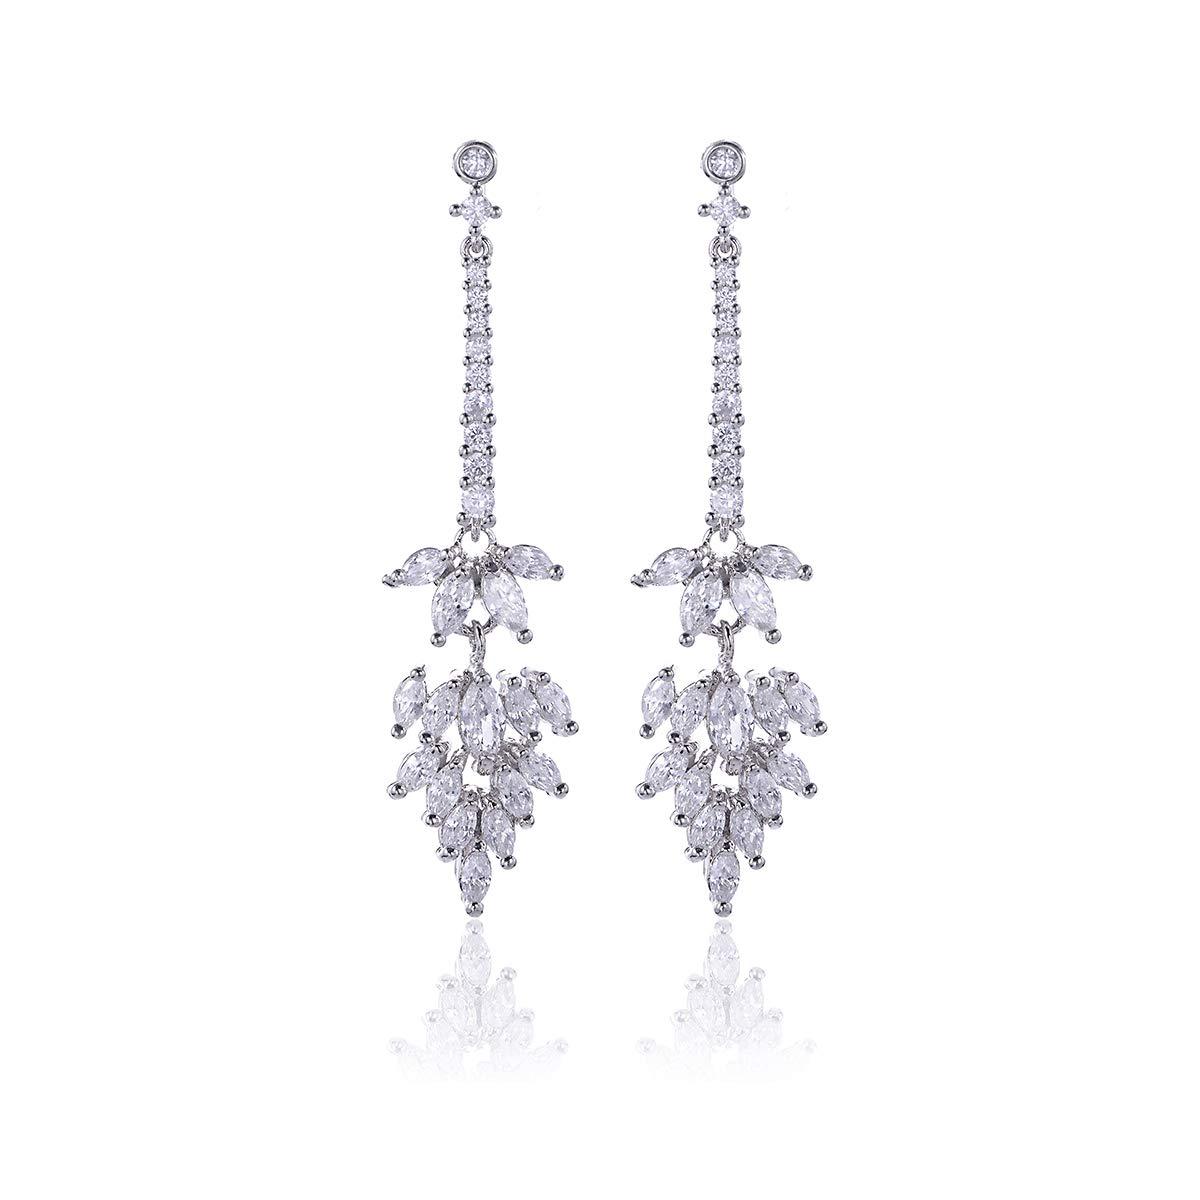 Floral Leaf Cluster Stud Earrings 14K Plated Marquise Crystal CZ Stud Hypoallergic Earrings For Women Girls